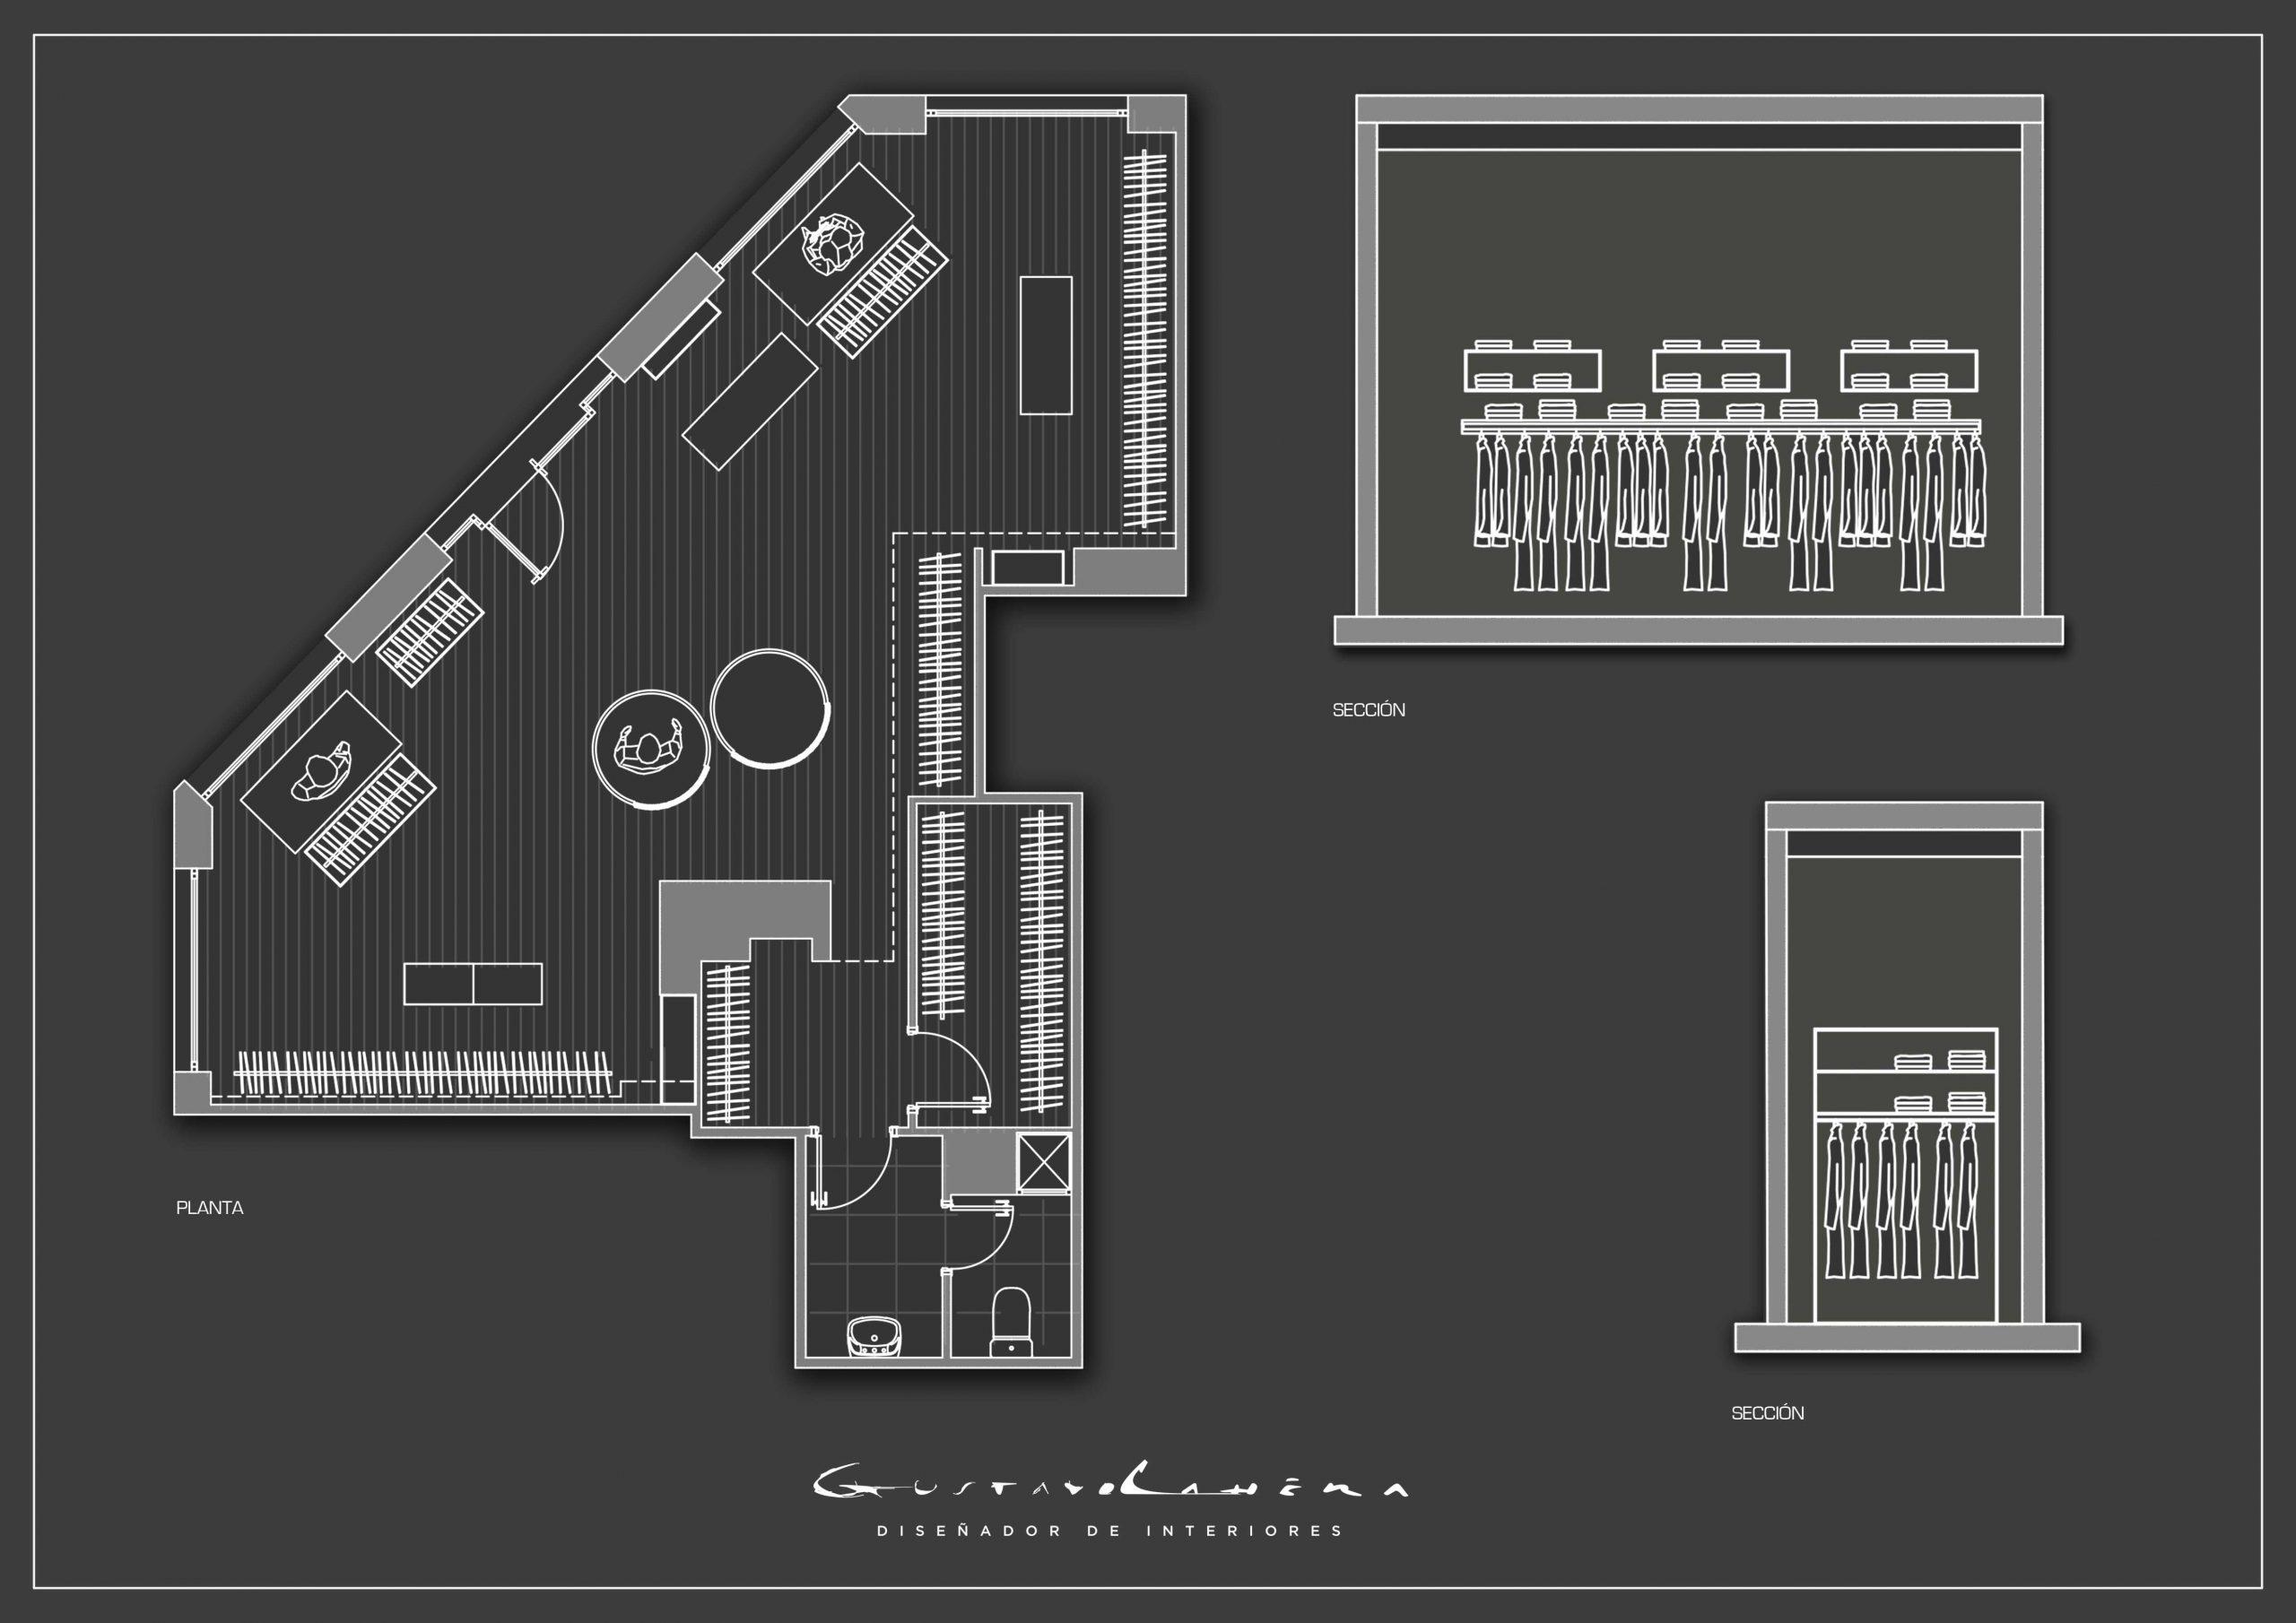 http://gustavolahera.com/wp-content/uploads/2020/11/Foto-0-Seis-Grados-scaled.jpg